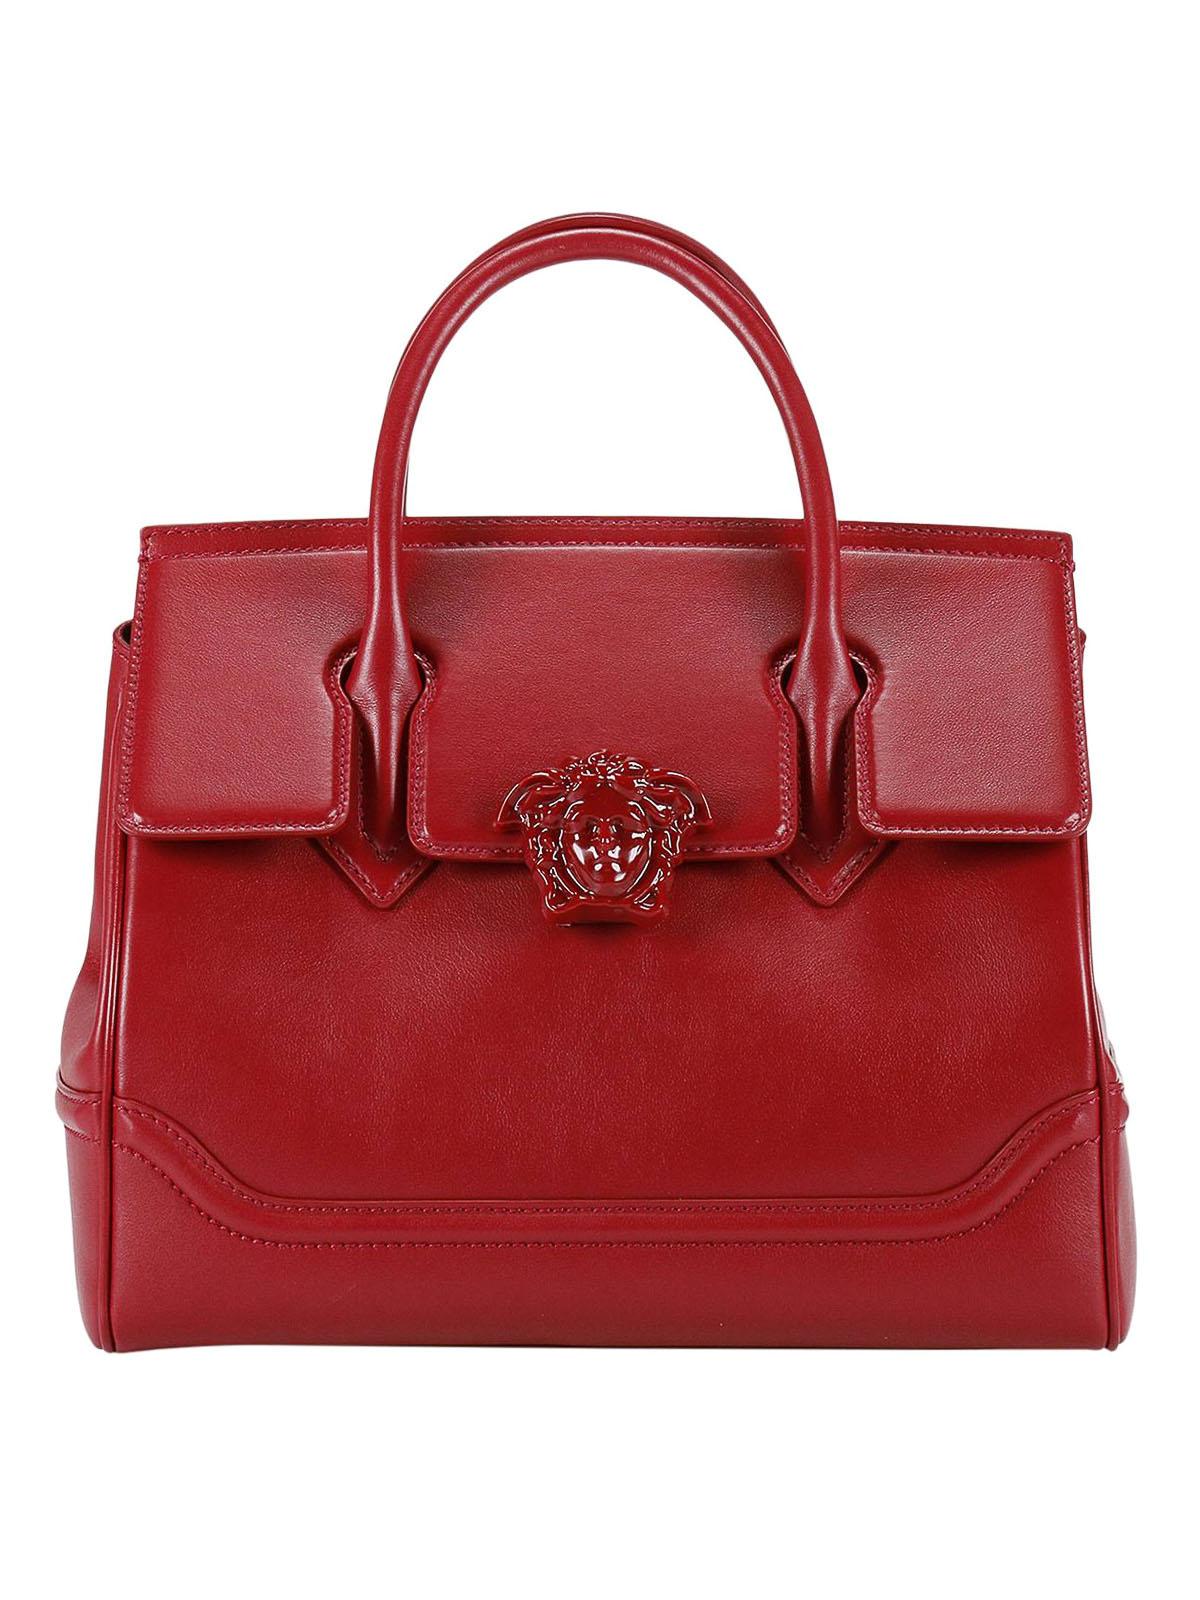 58f4d1db437e Versace - Palazzo Empire large bag - bowling bags - DBFF453NDSTVTKW5JP